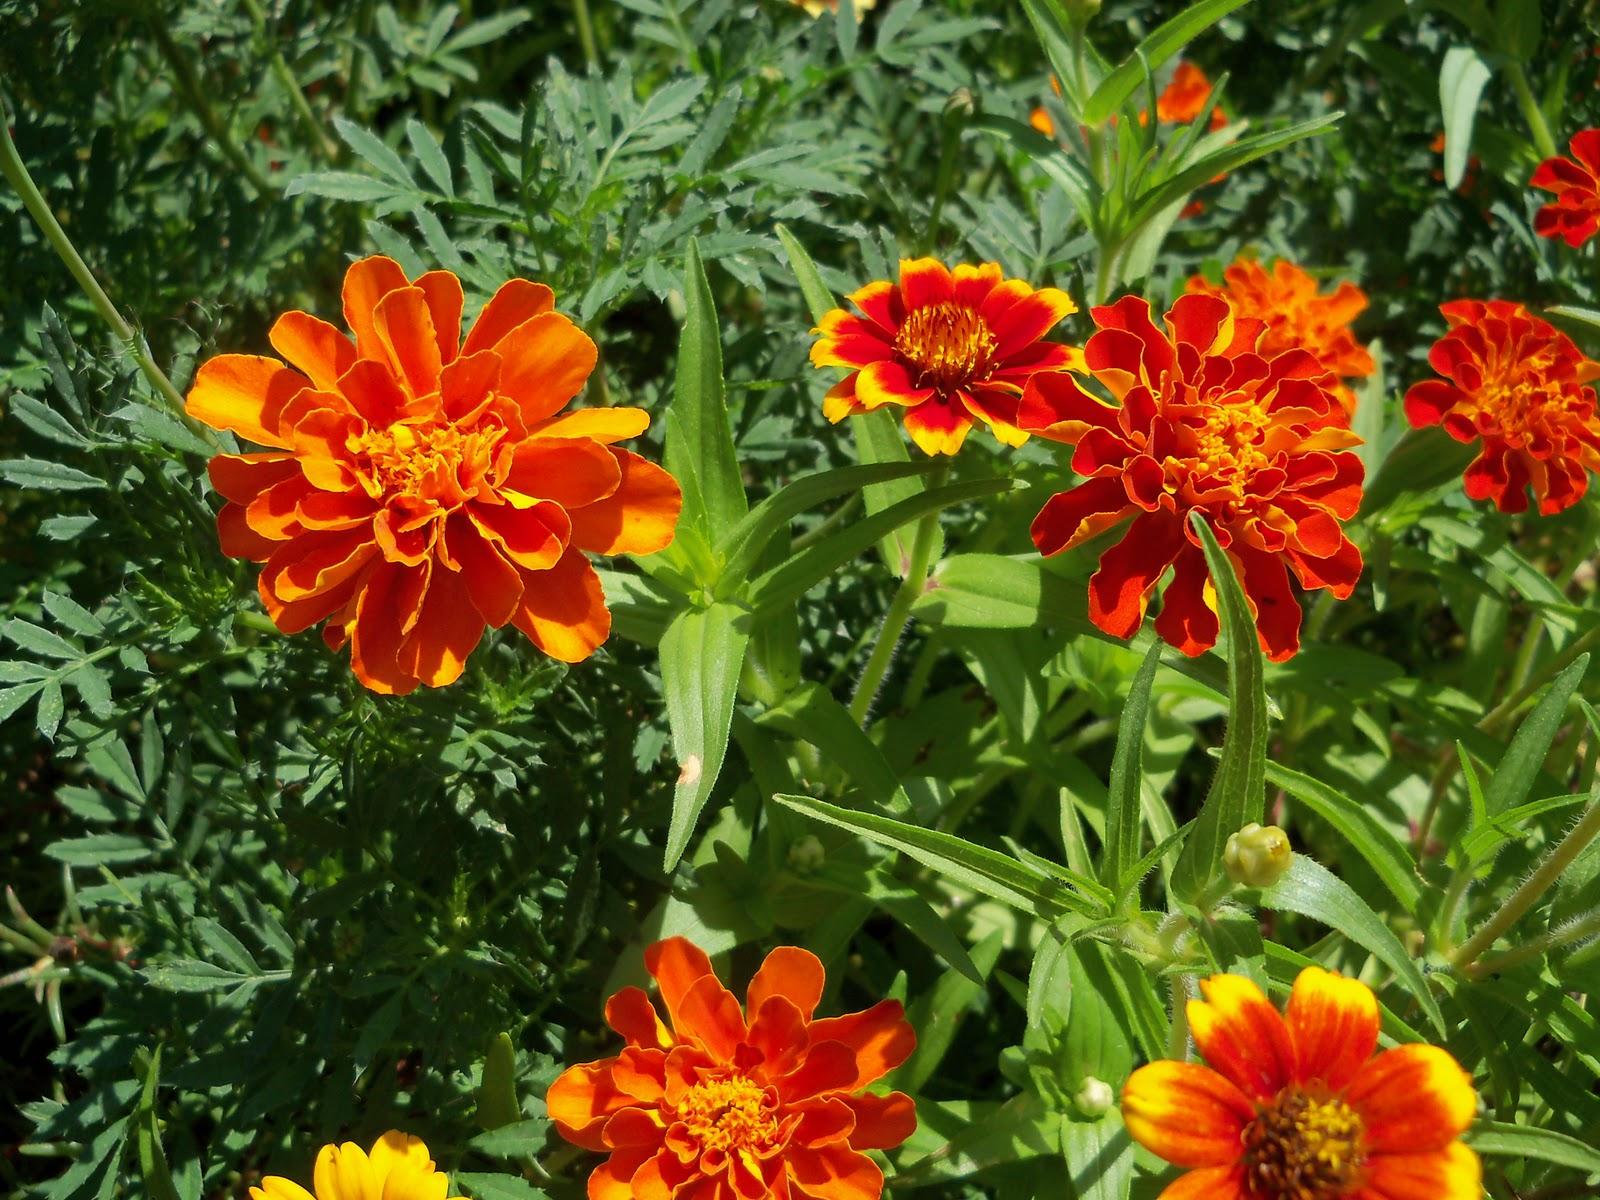 Gardening 2010, Part Three - 101_4387.JPG